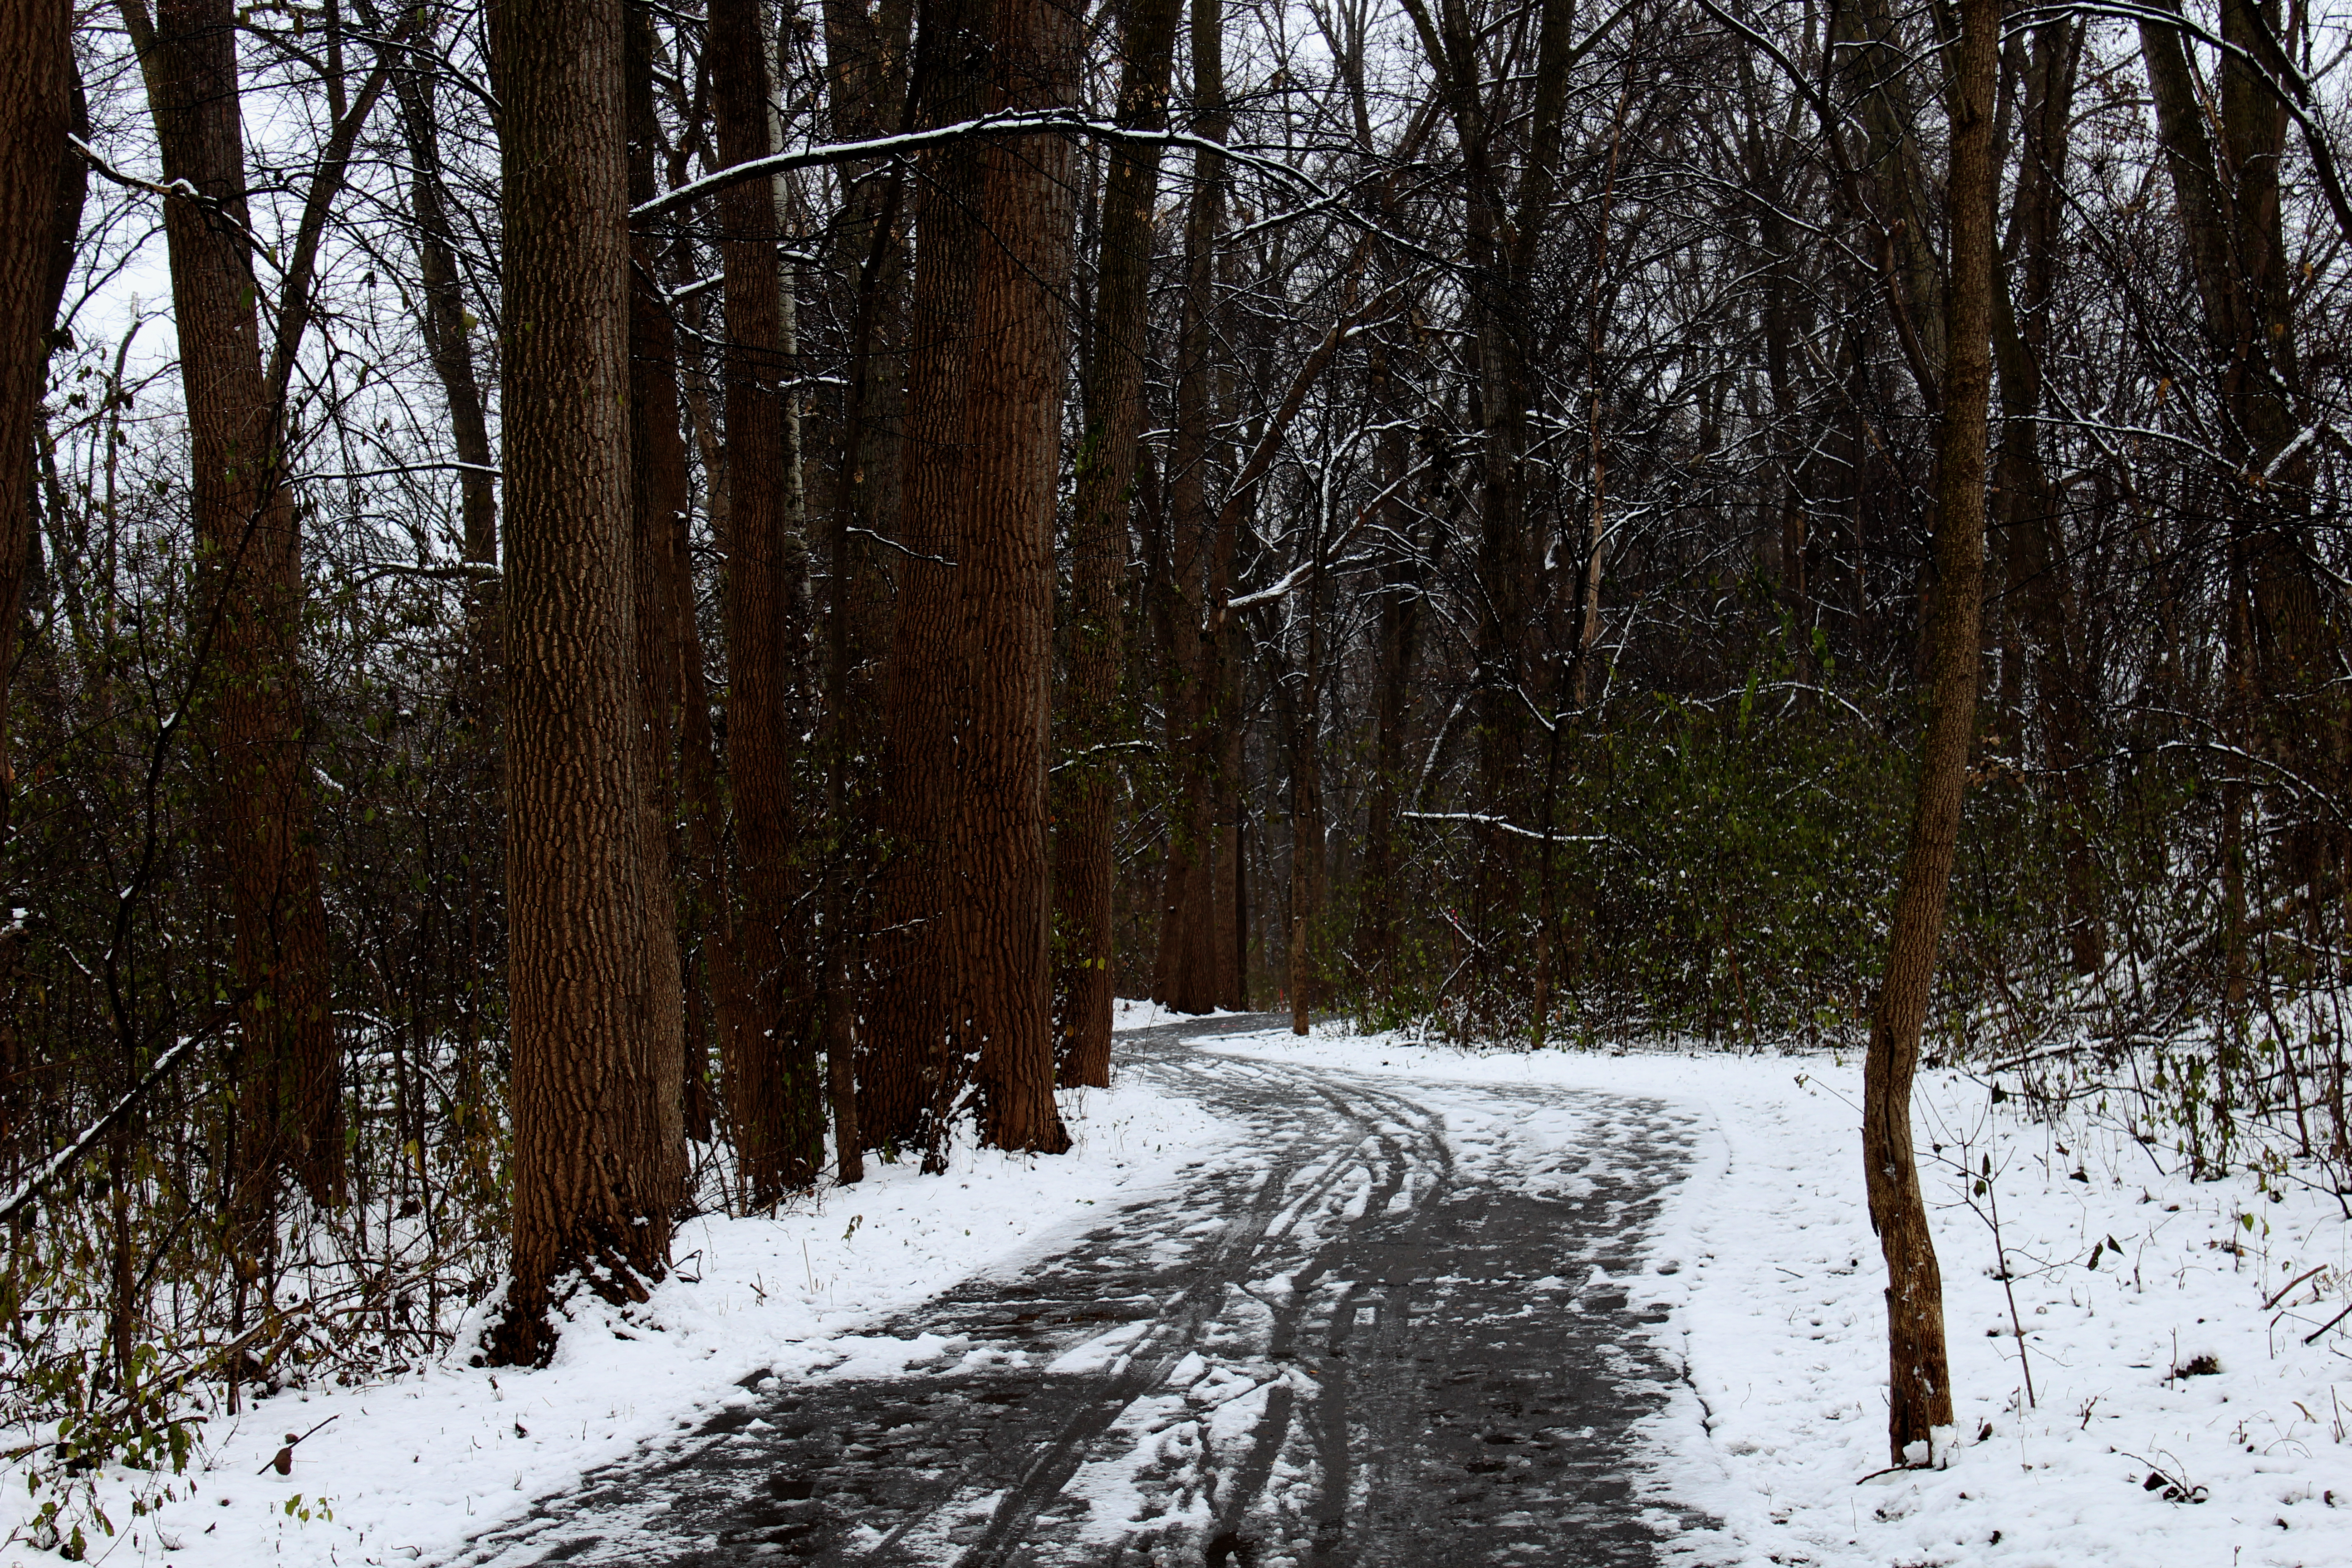 polzine_winter_landscape1